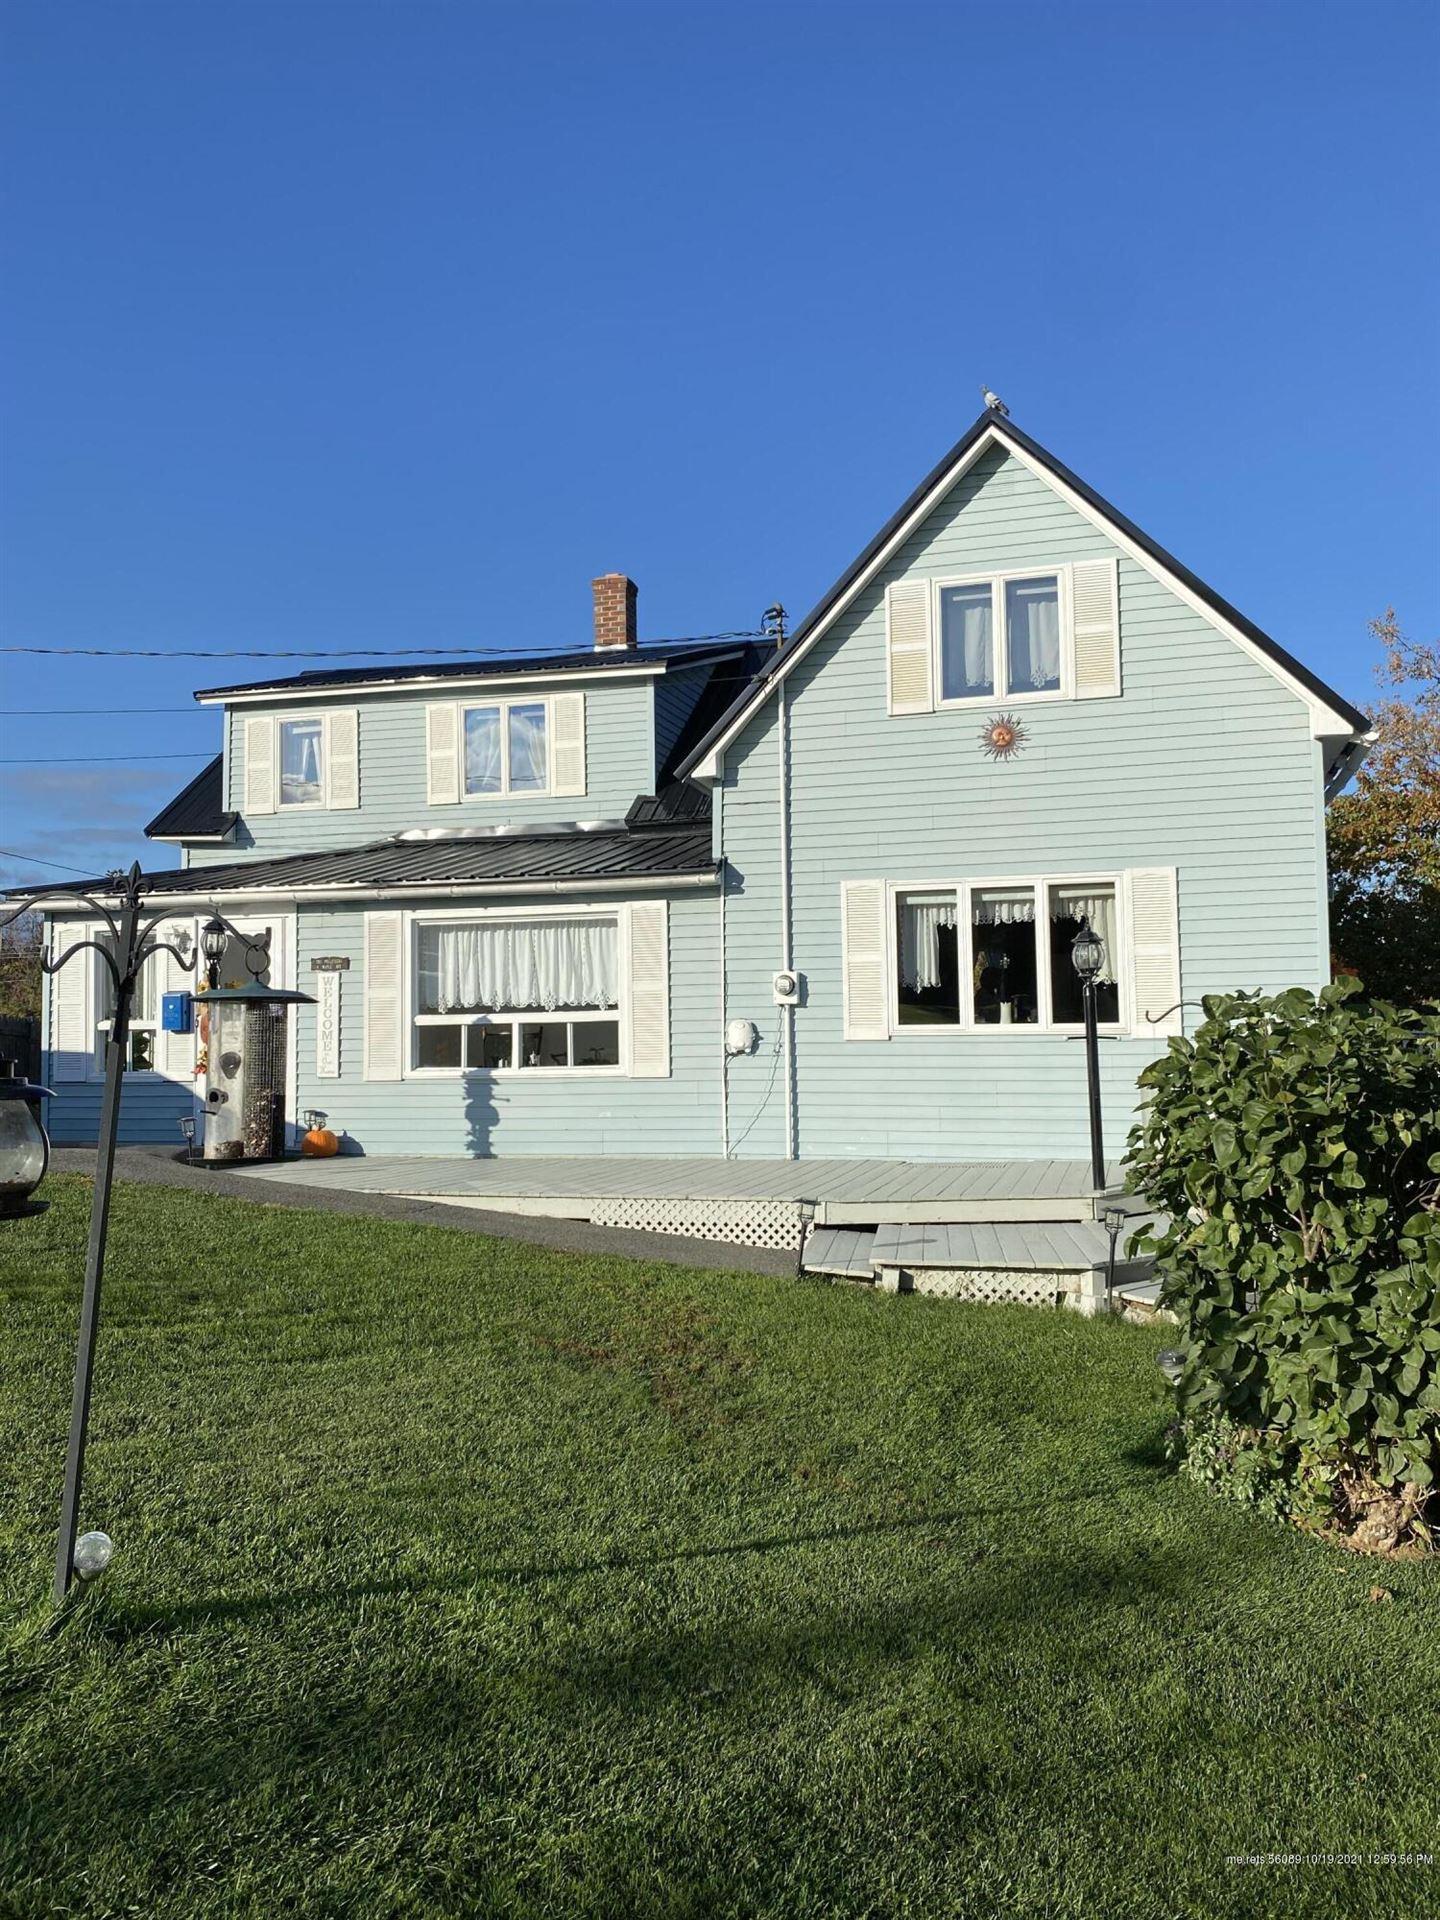 Photo of 6 Maple Avenue, Caribou, ME 04736 (MLS # 1512454)